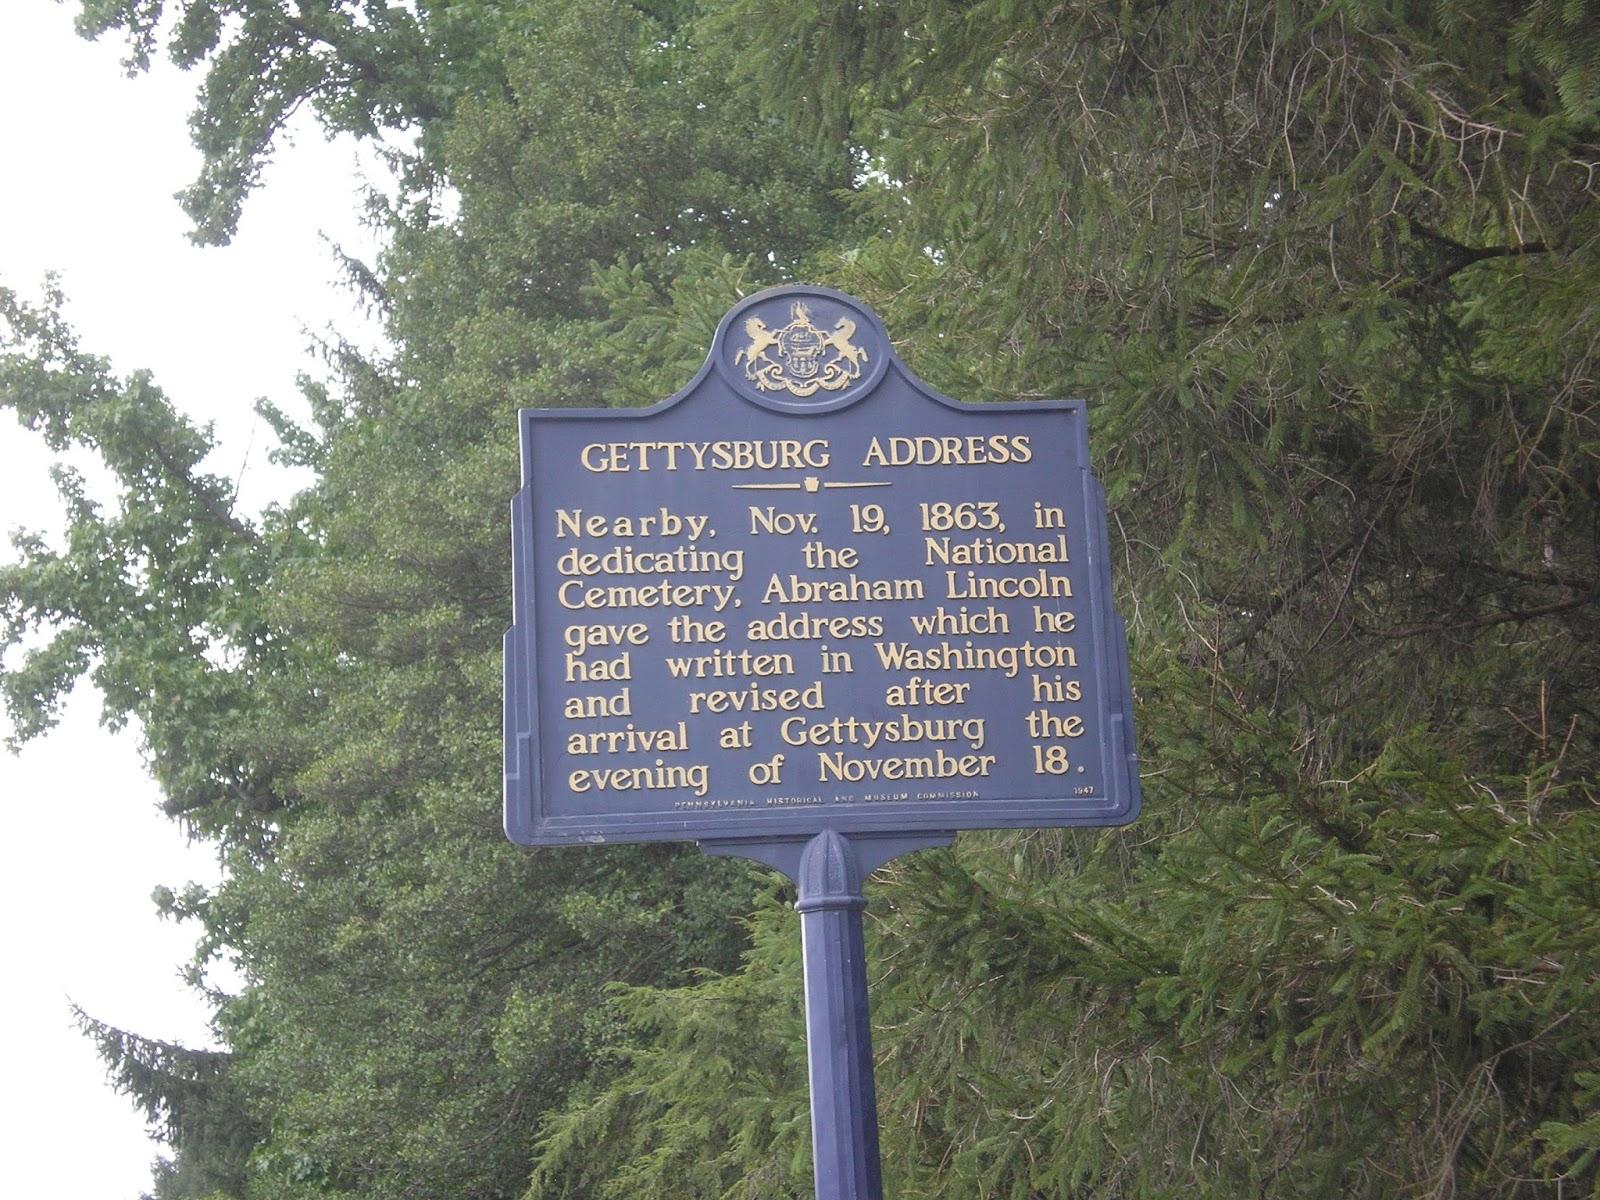 The Road Genealogist The Gettysburg Address